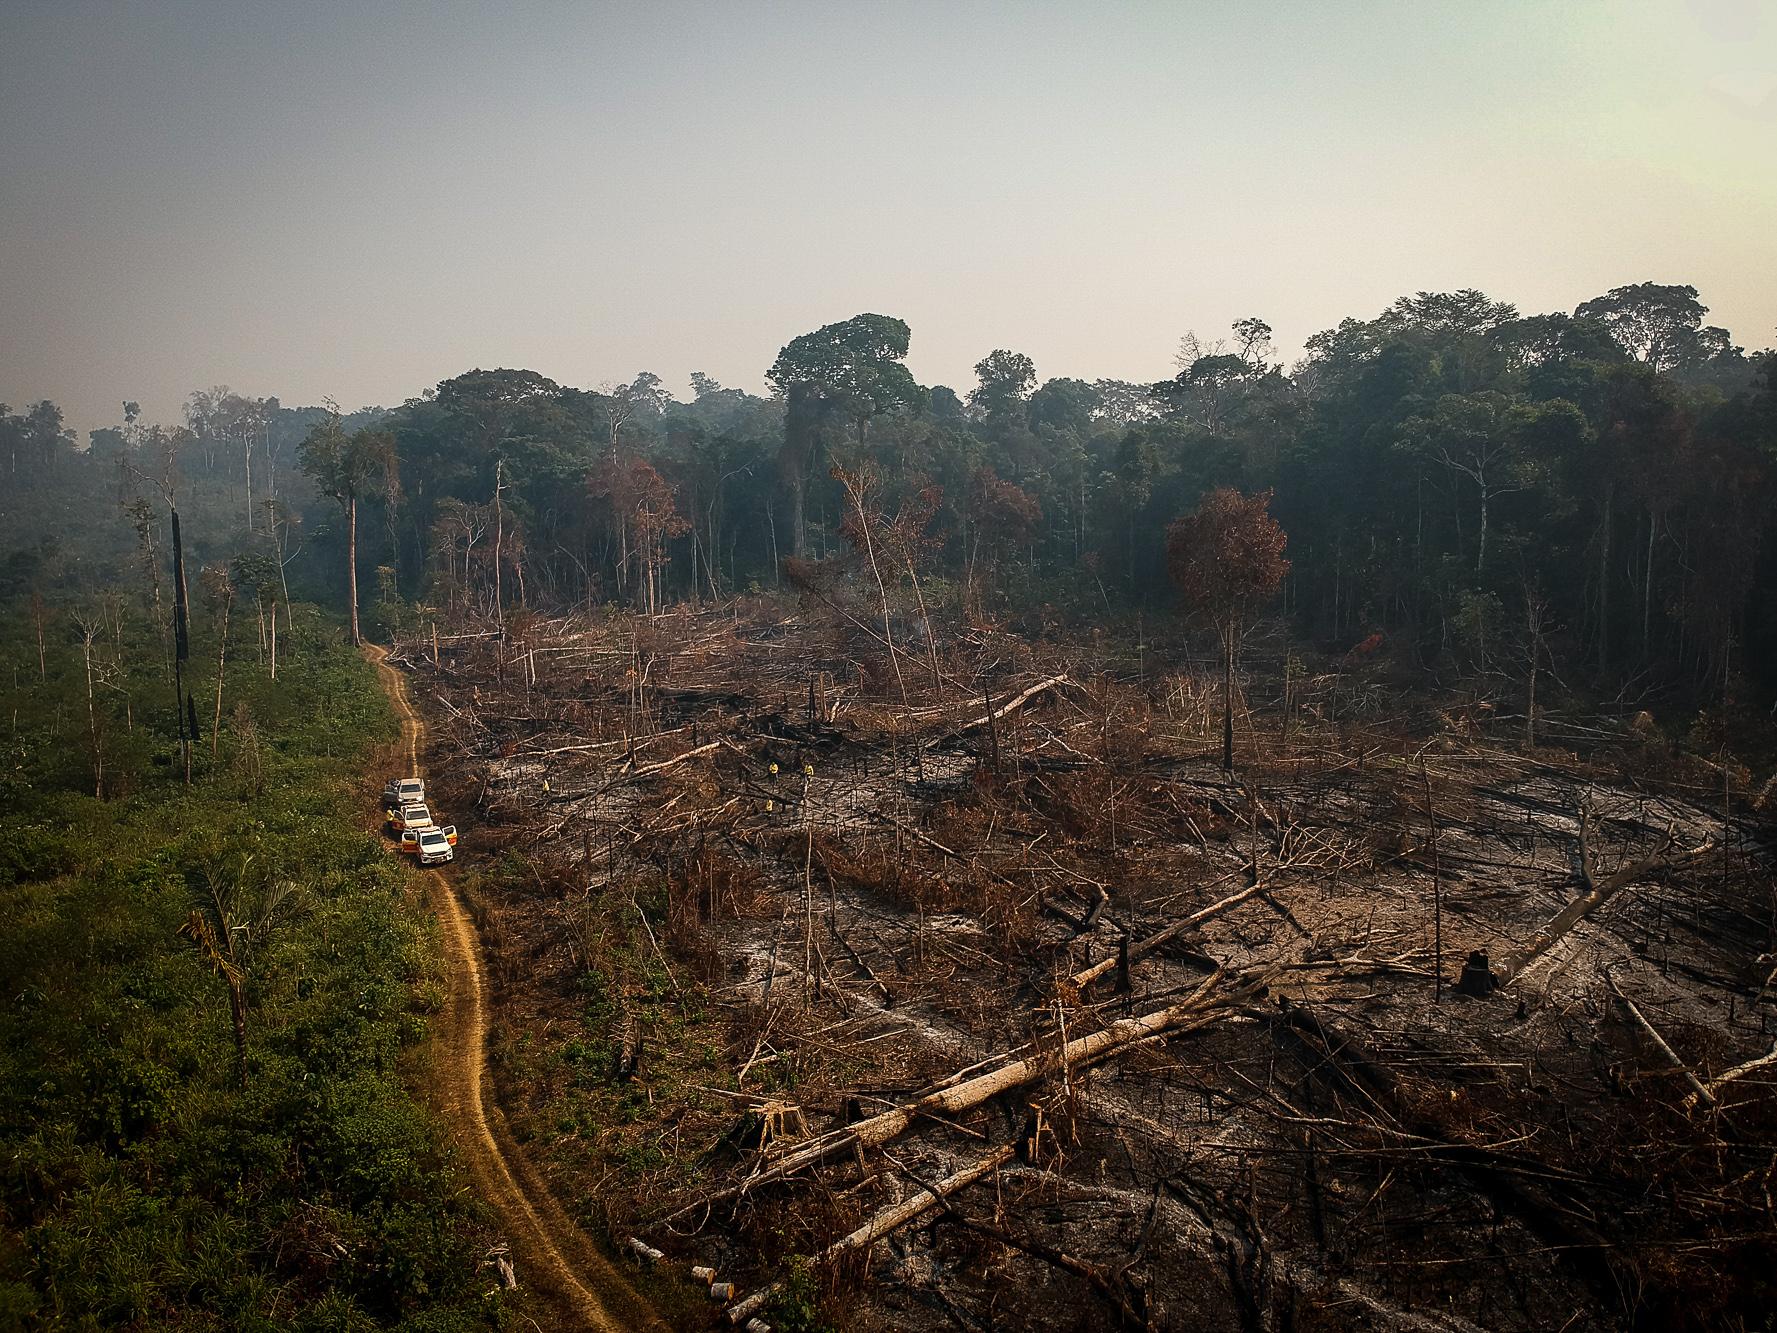 Amazonian Communities Urge International Action & Amazon.com Invests in Restoration